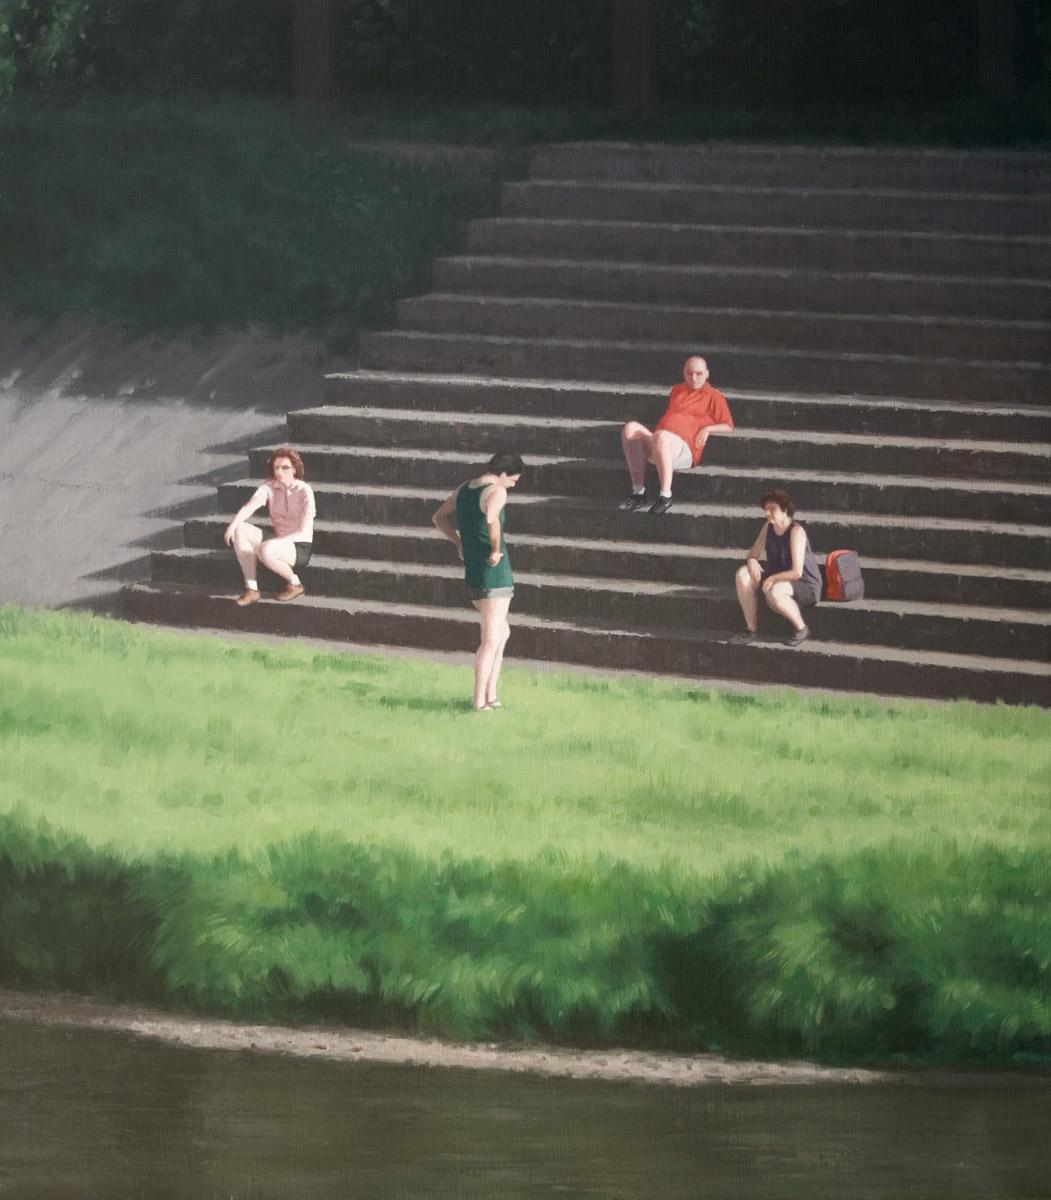 Another Sunday, Serban Savu, 2007, Huile sur toile, 120 x 105 cm   — Galerie Éric Hussenot, Paris